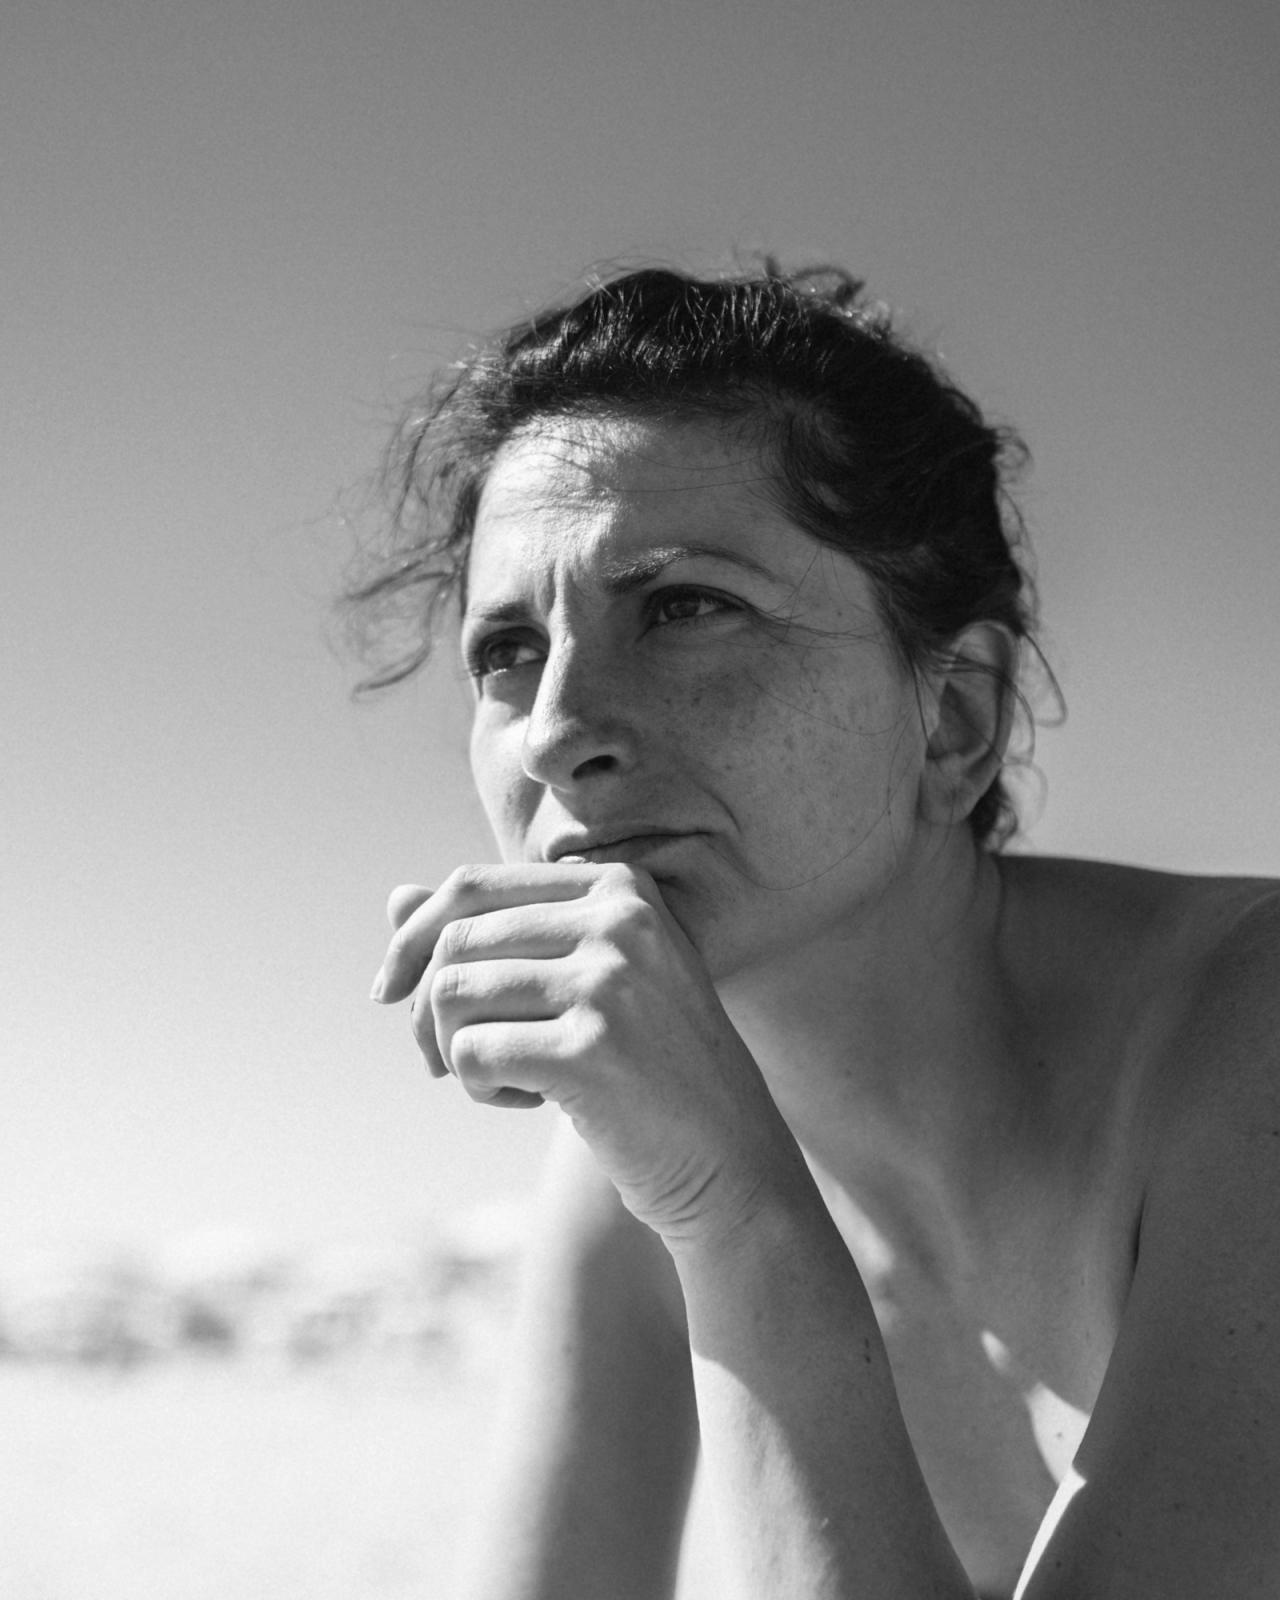 Gabri portrait, she is facing the sea